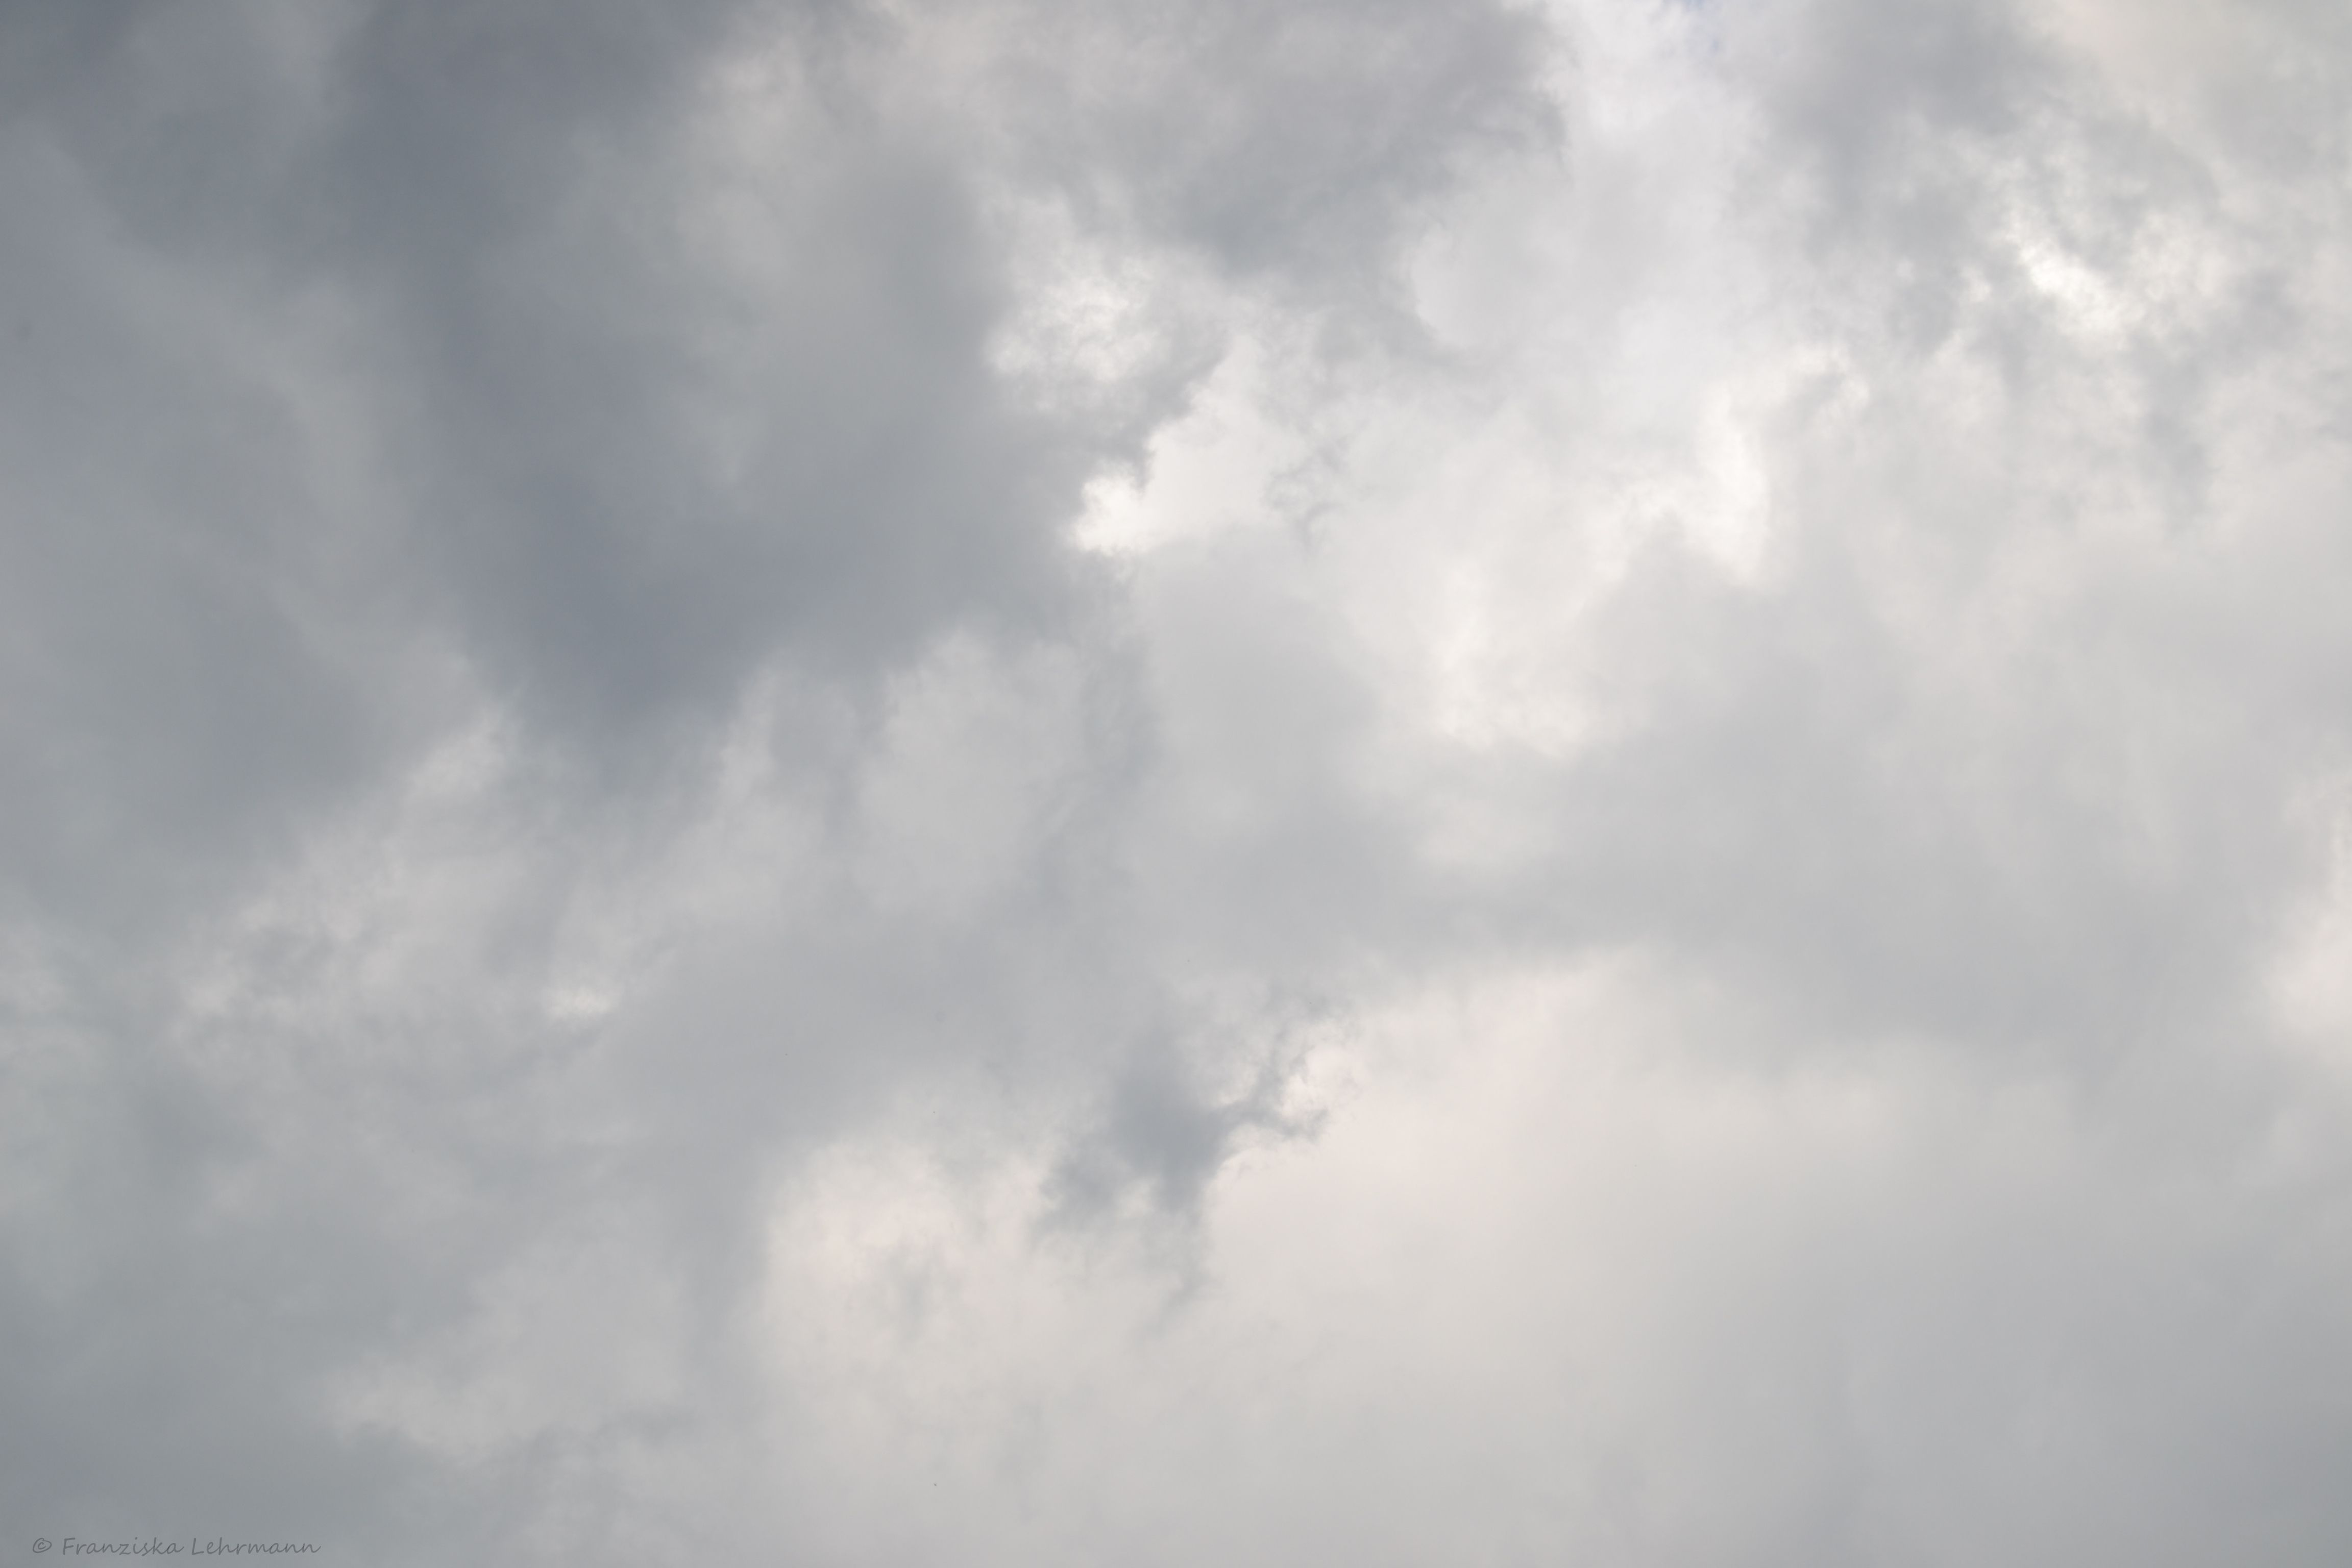 Rainy afternoon sky